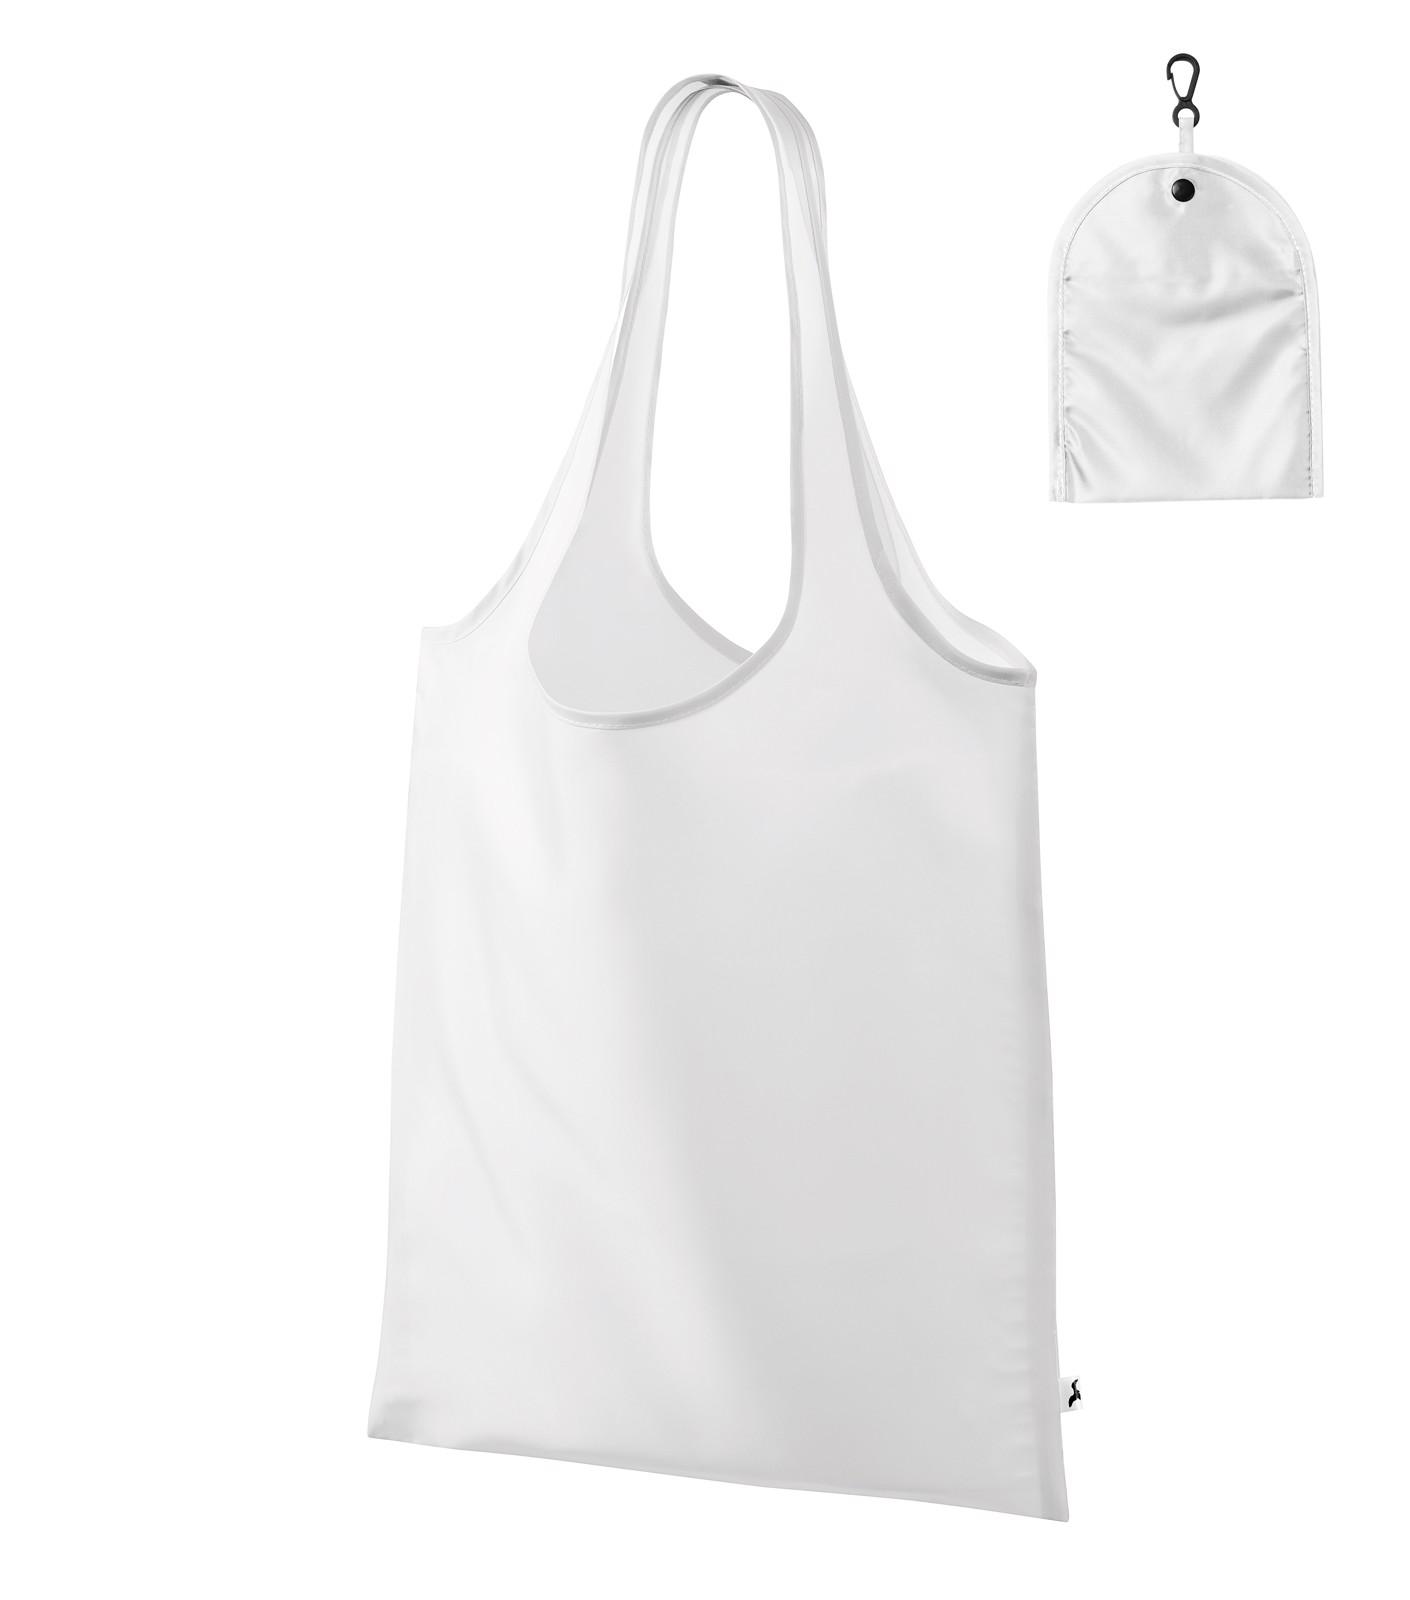 Shopping Bag unisex Malfini Smart - White / uni